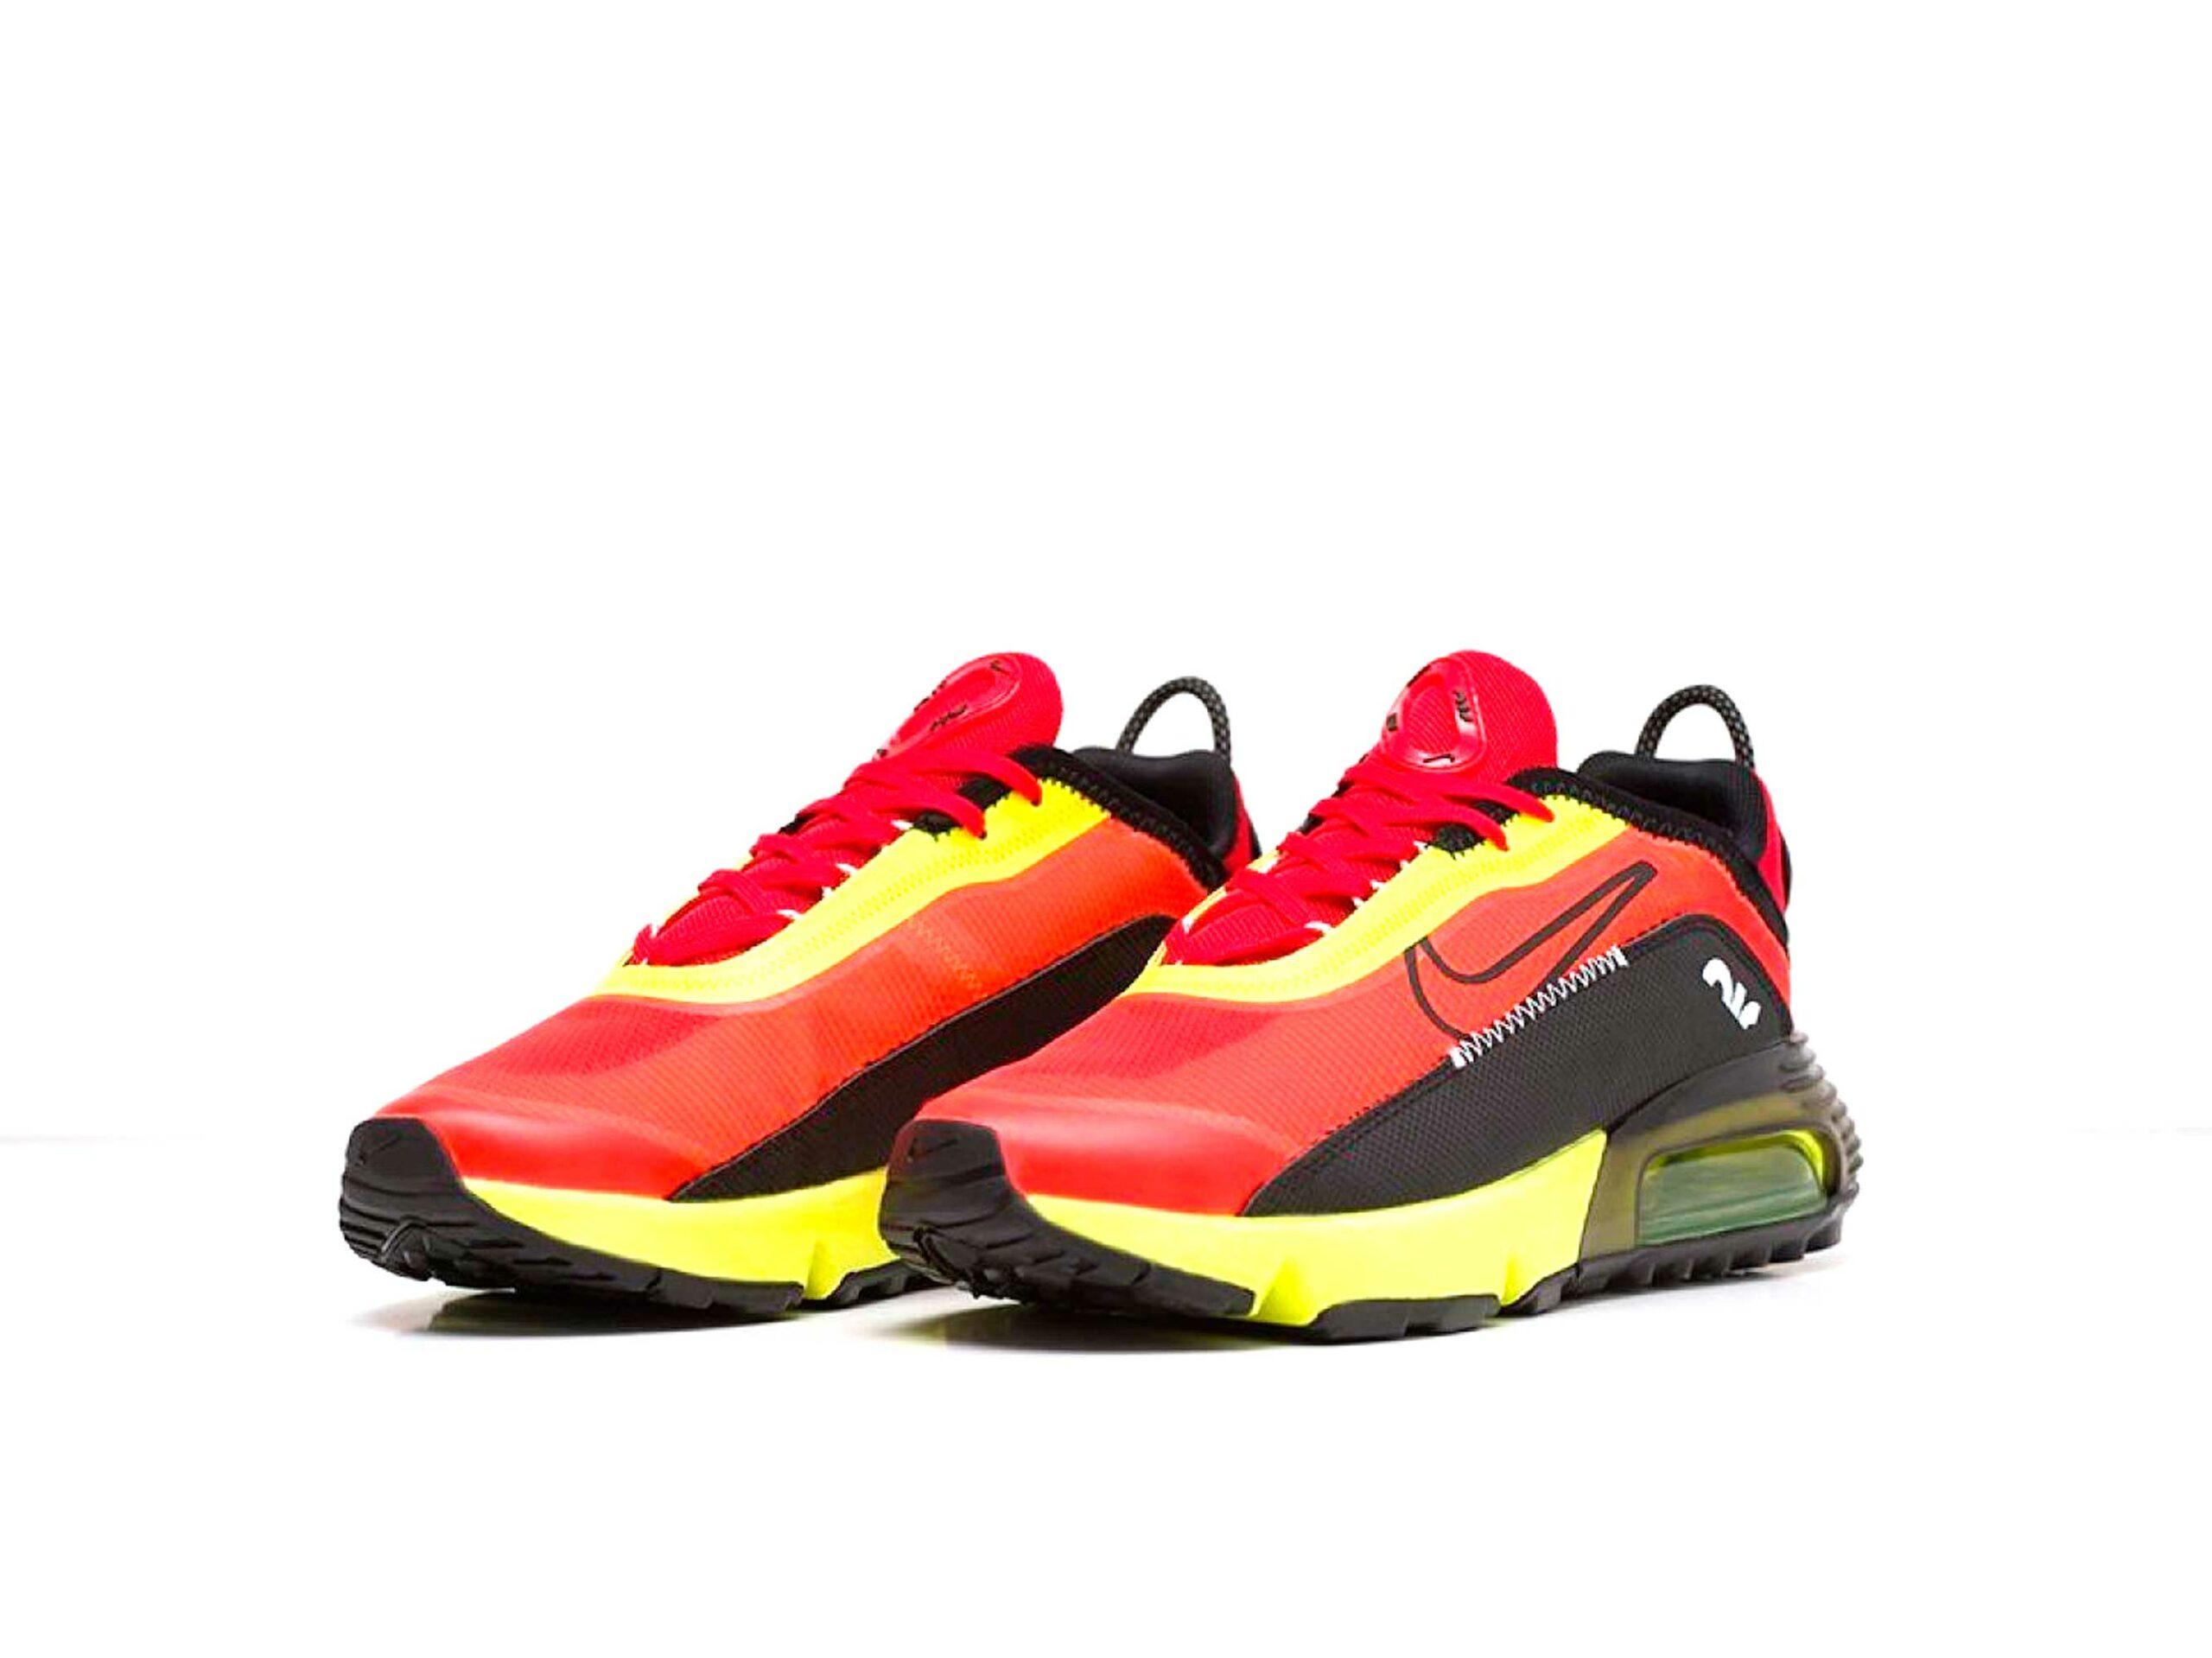 nike air max 2090 red yellow CT7698_006 купить